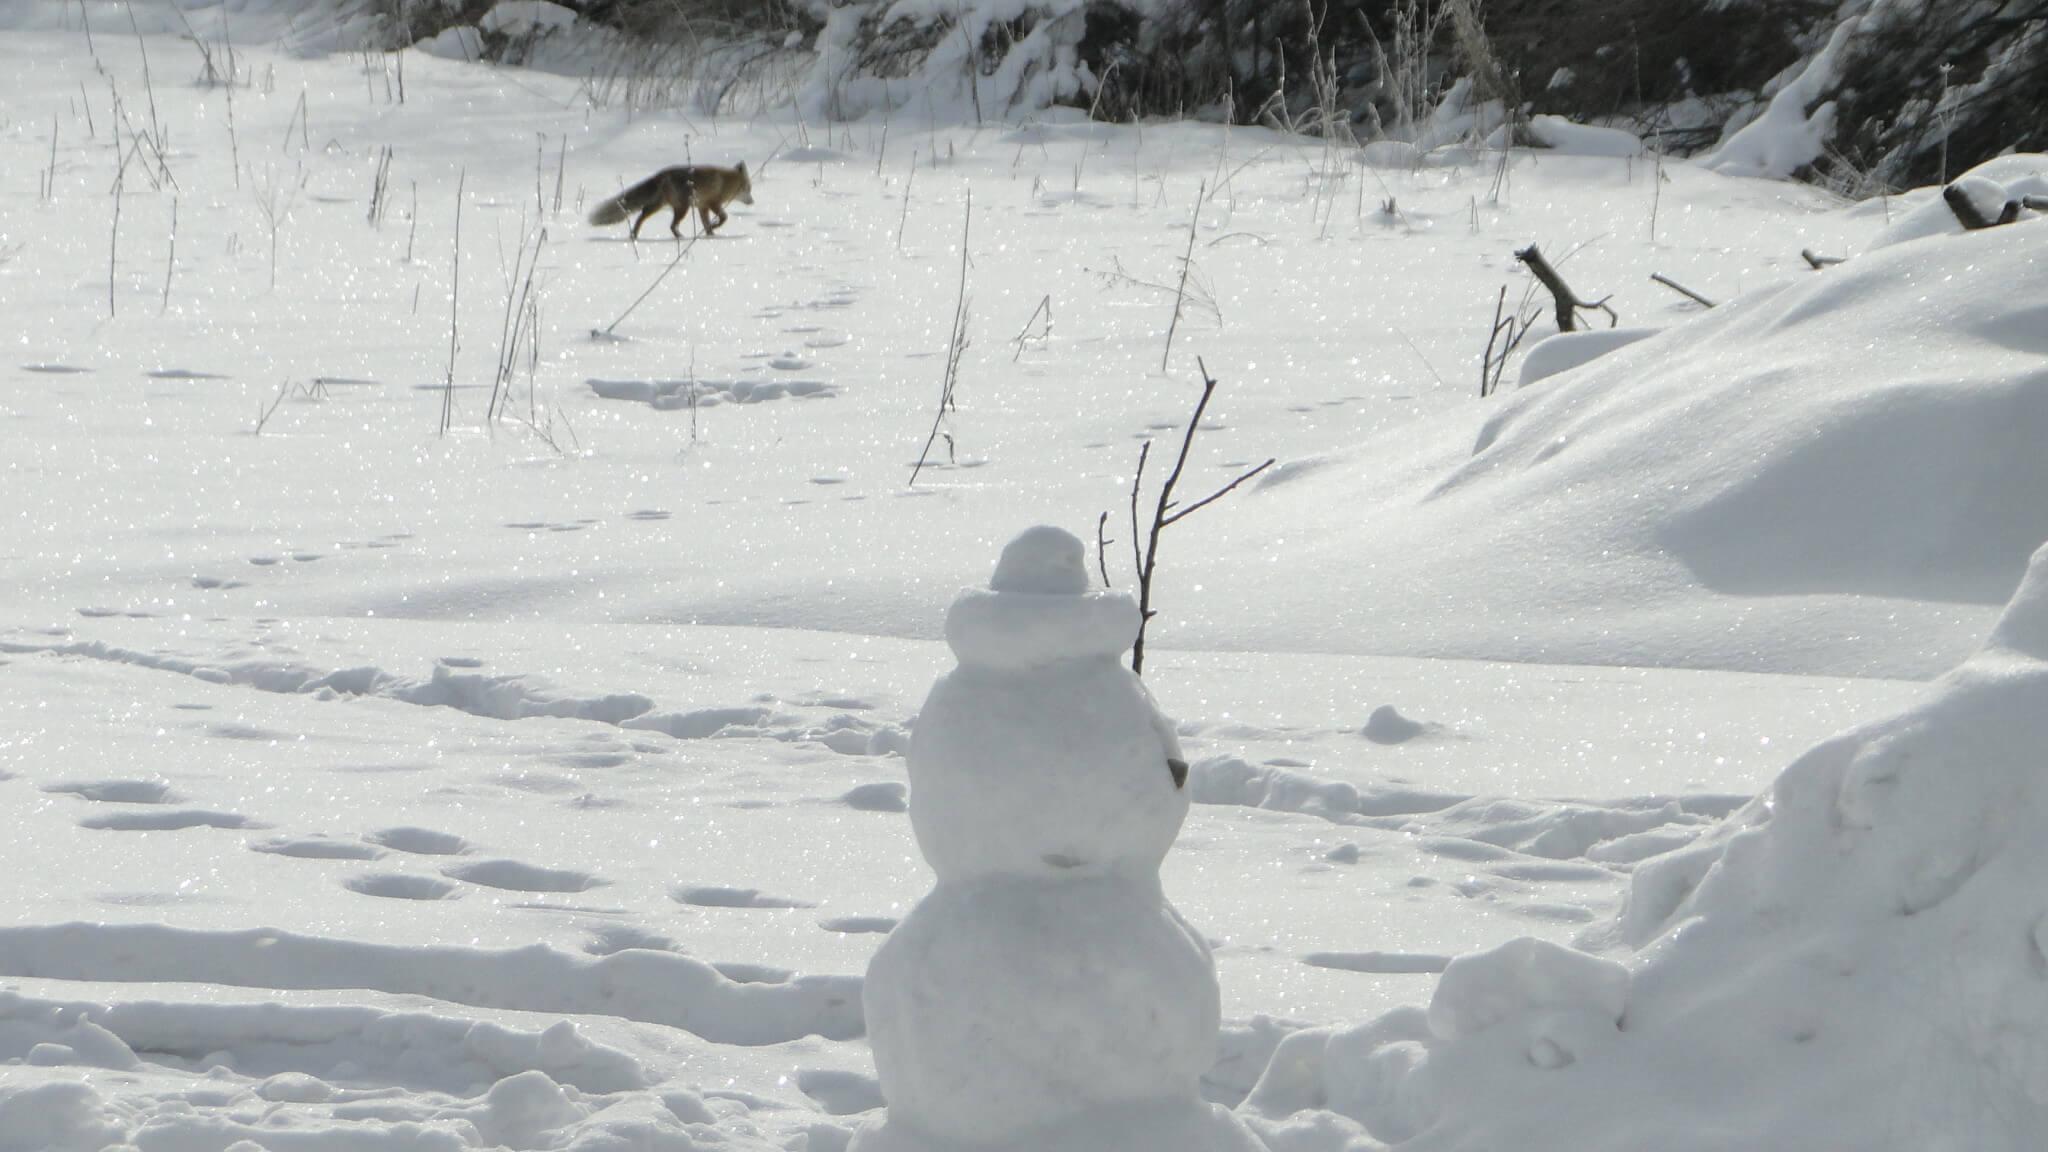 Lutowa zima - śnieżna i mroźna 21